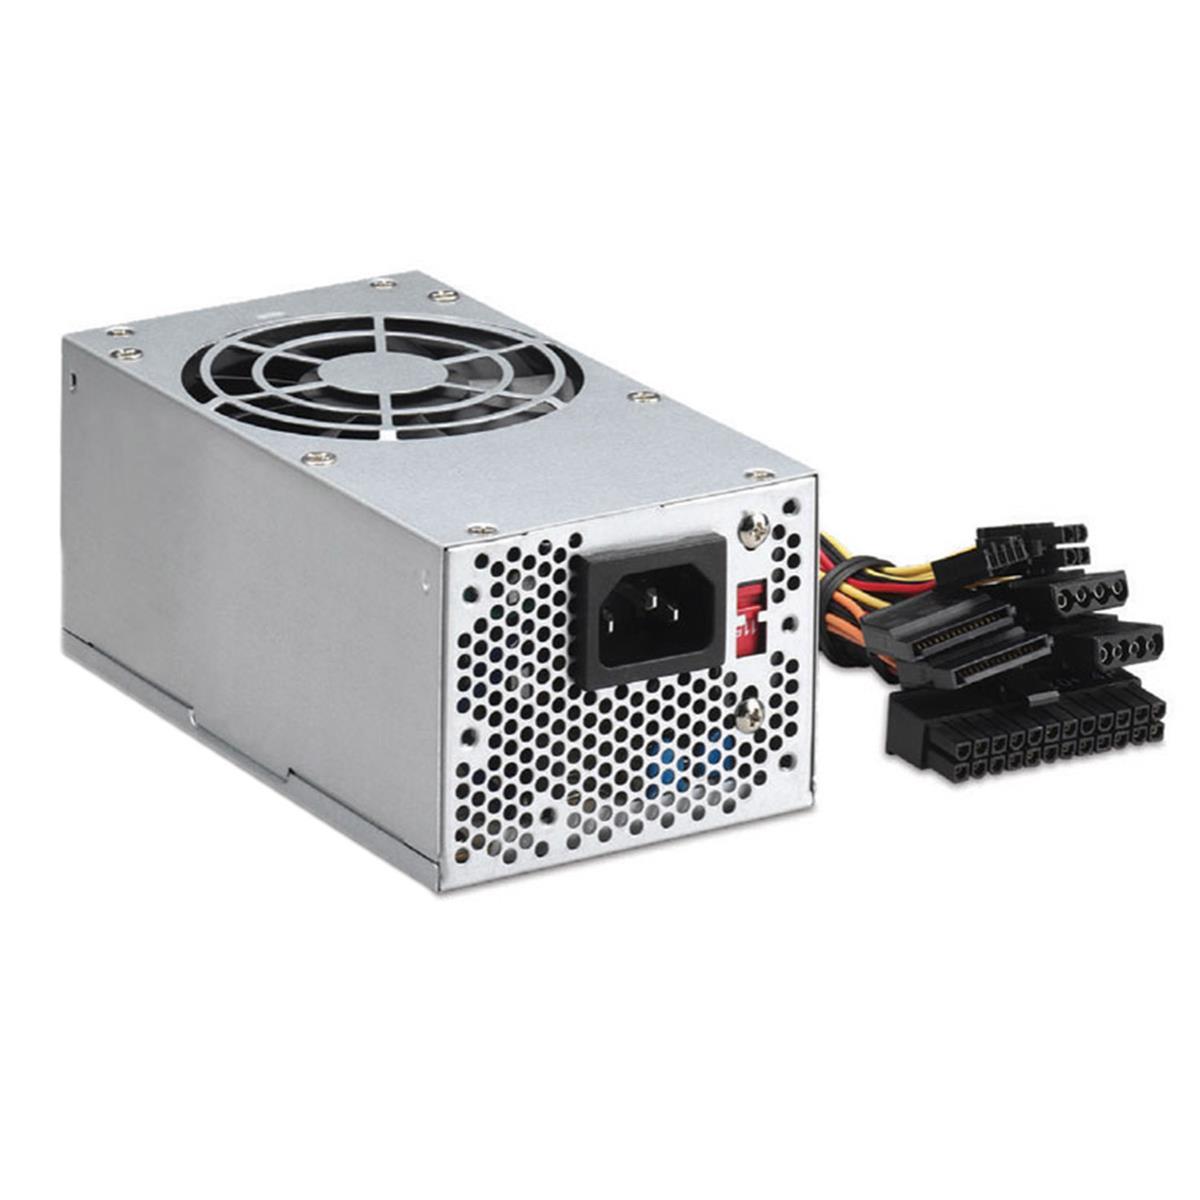 Mini Fonte TFX 230w PD-230ROG K-mex Para Gabinete Ci-9d89 9e89 9f89